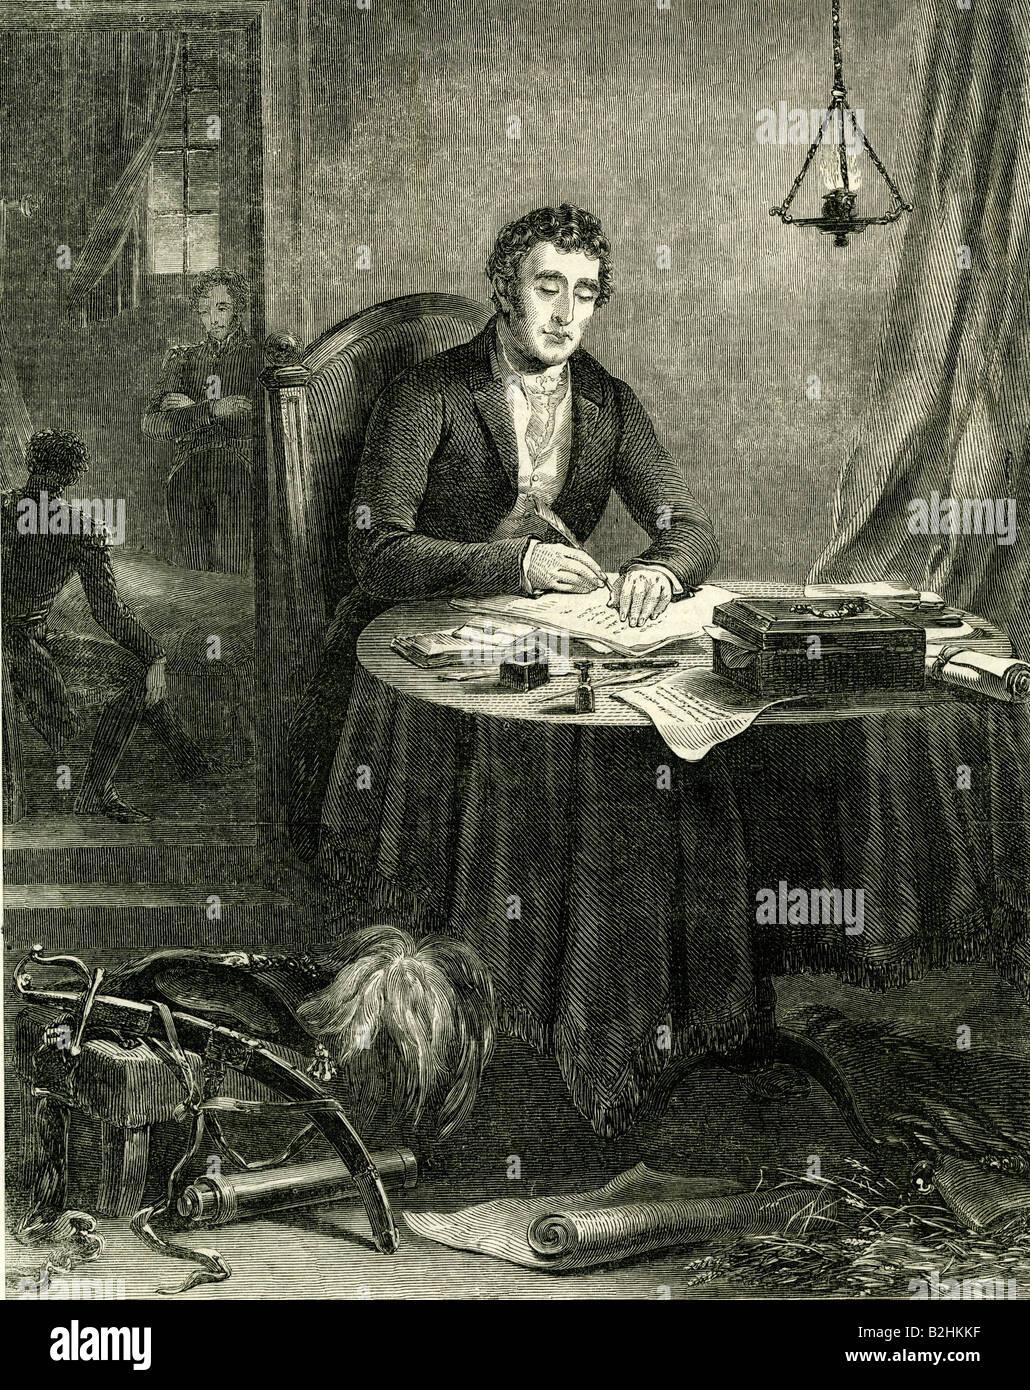 Wellington, Arthur Wellesley, 1st Duke of Wellington, 1.5.1769 - 14.9.1852, British politician, half length, after - Stock Image